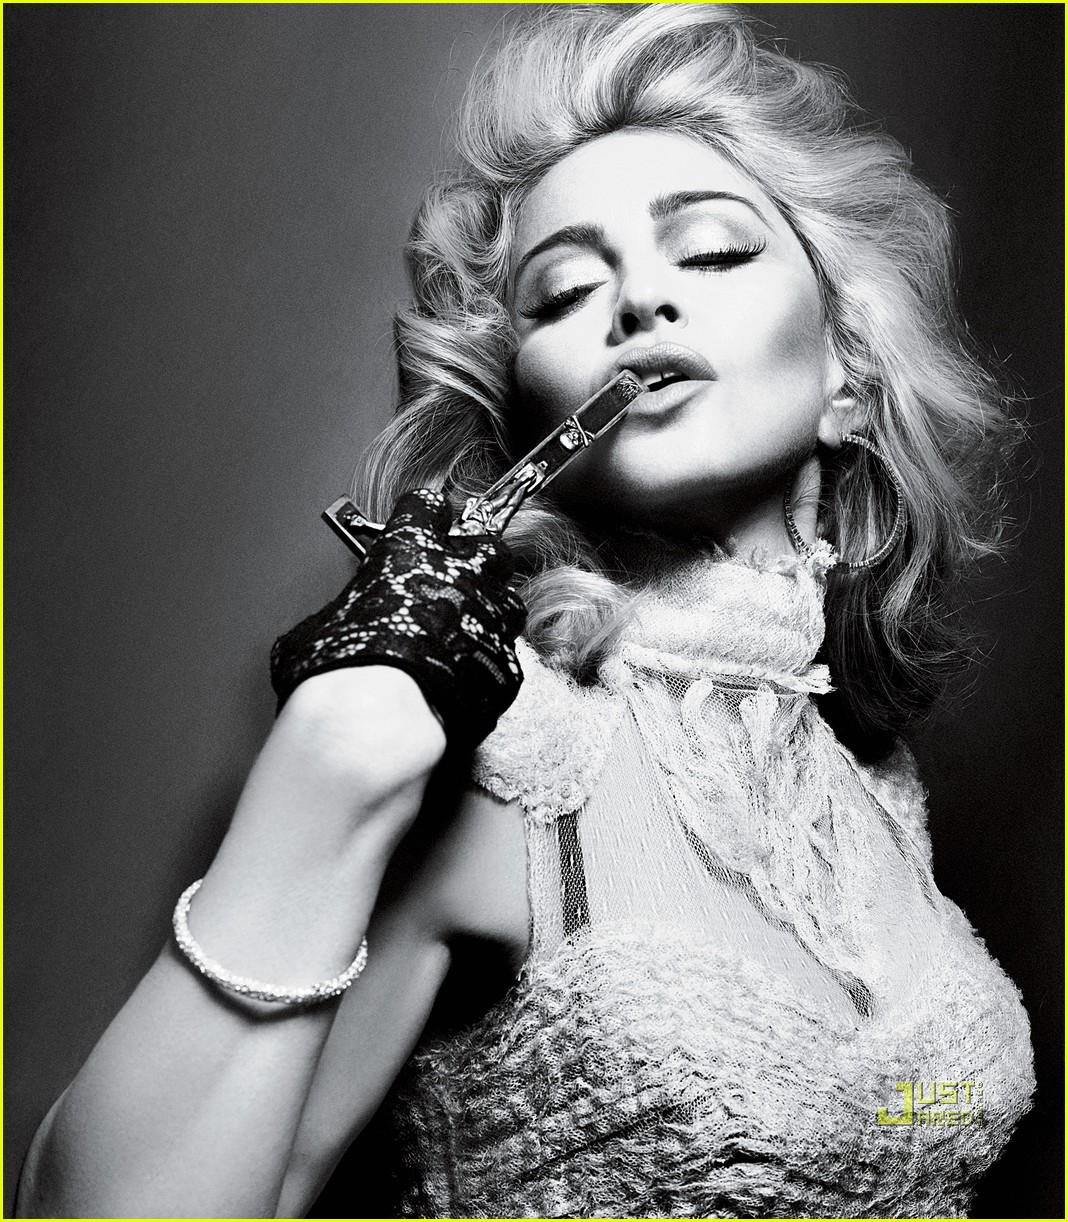 http://2.bp.blogspot.com/_AY6i1kASjeY/TBvZTraaubI/AAAAAAAAB1M/zuFUSAHza1g/s1600/madonna-interview-magazine-crucifix-05.jpg